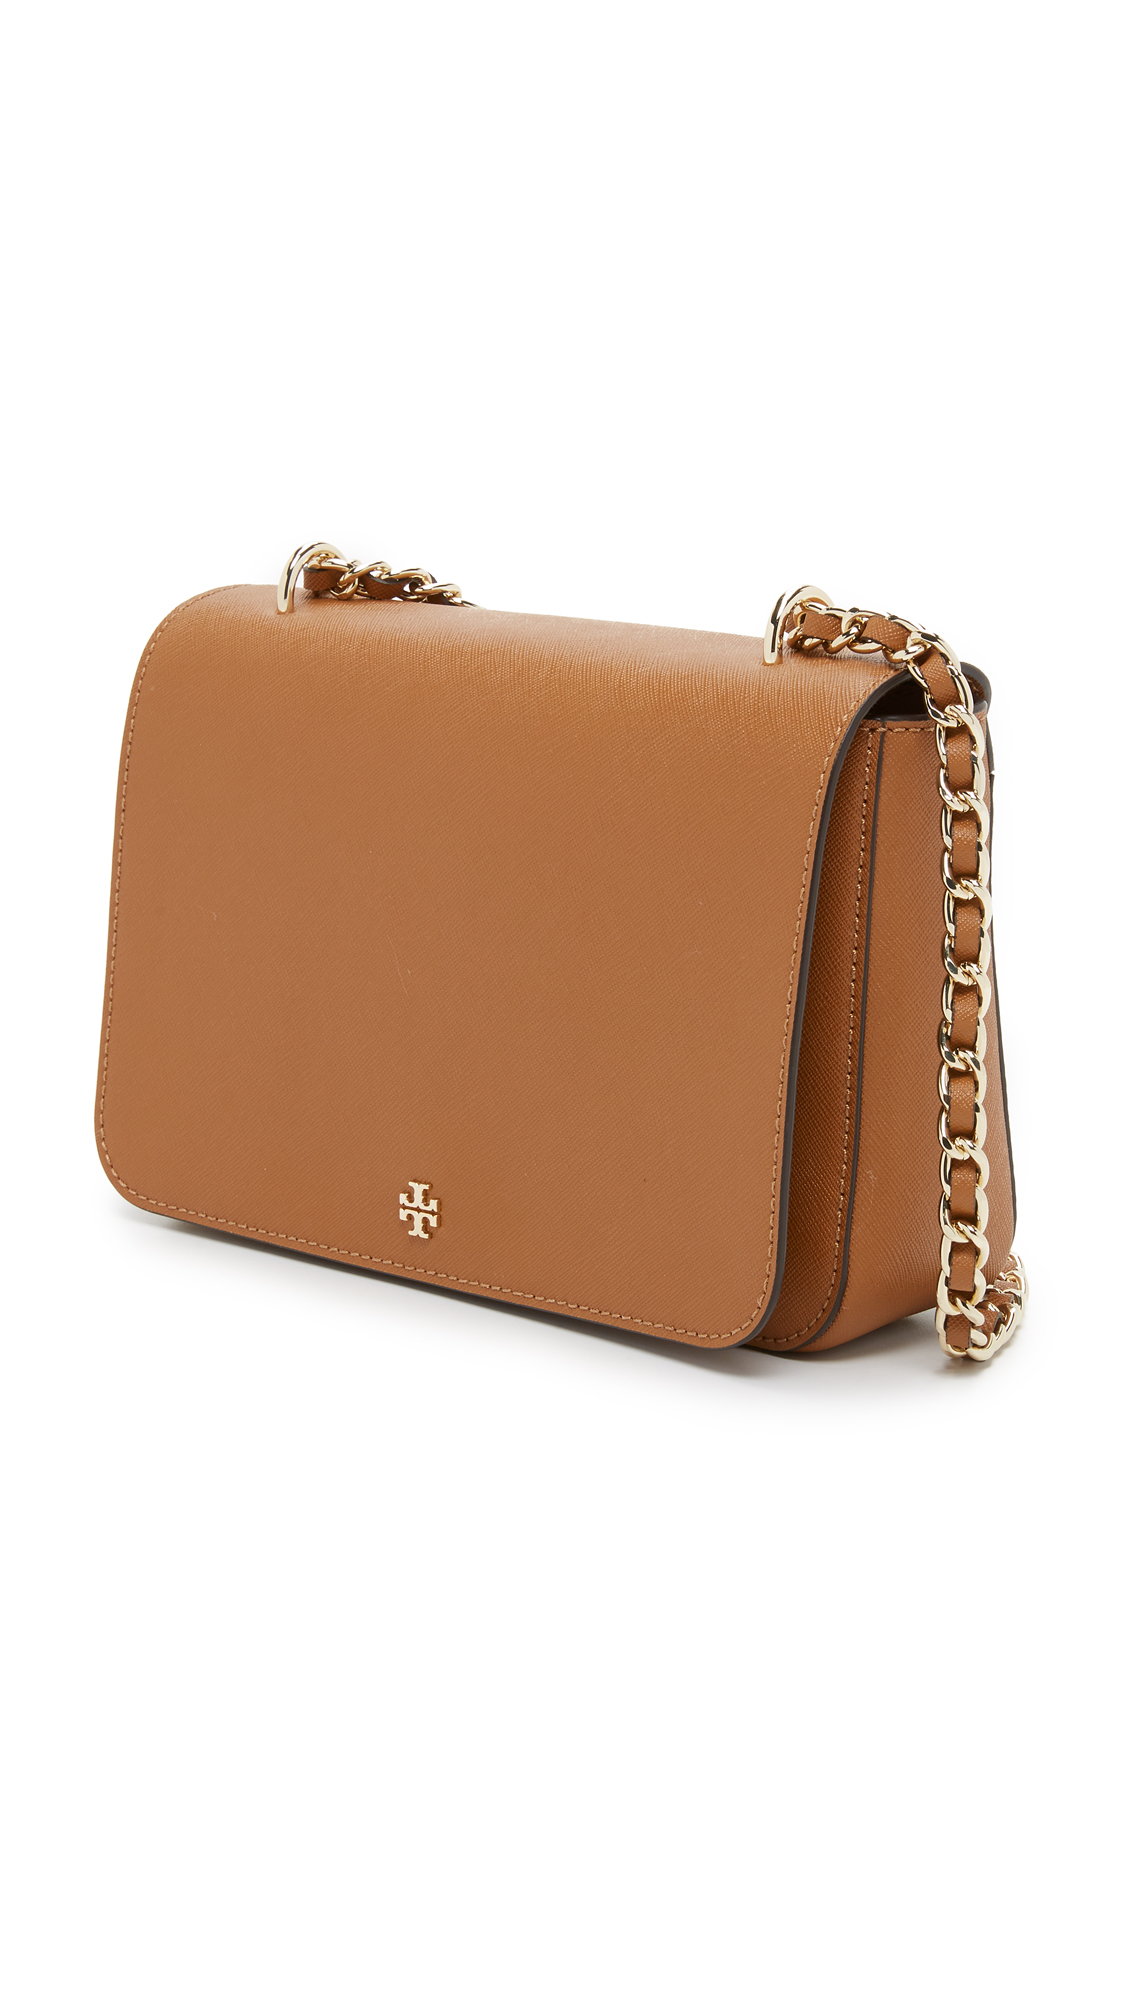 15a05e93e34e Lyst - Tory Burch Robinson Adjustable Shoulder Bag